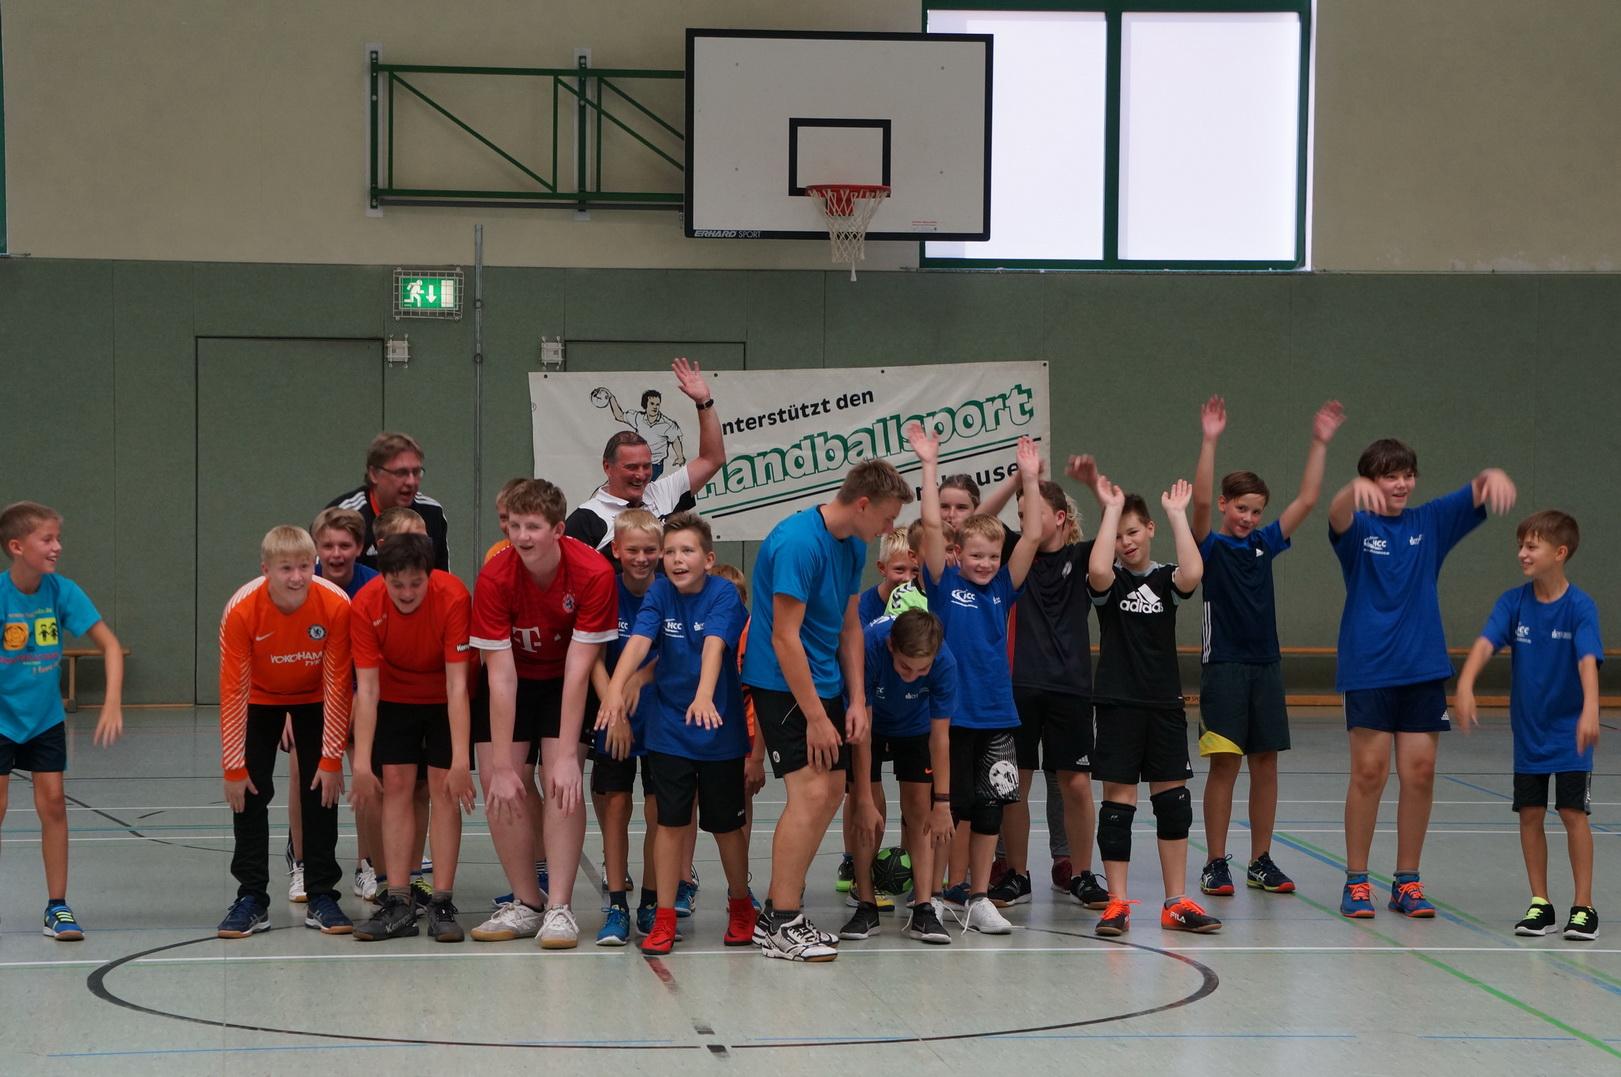 201808_Handballcamp_SDH_MG_297w